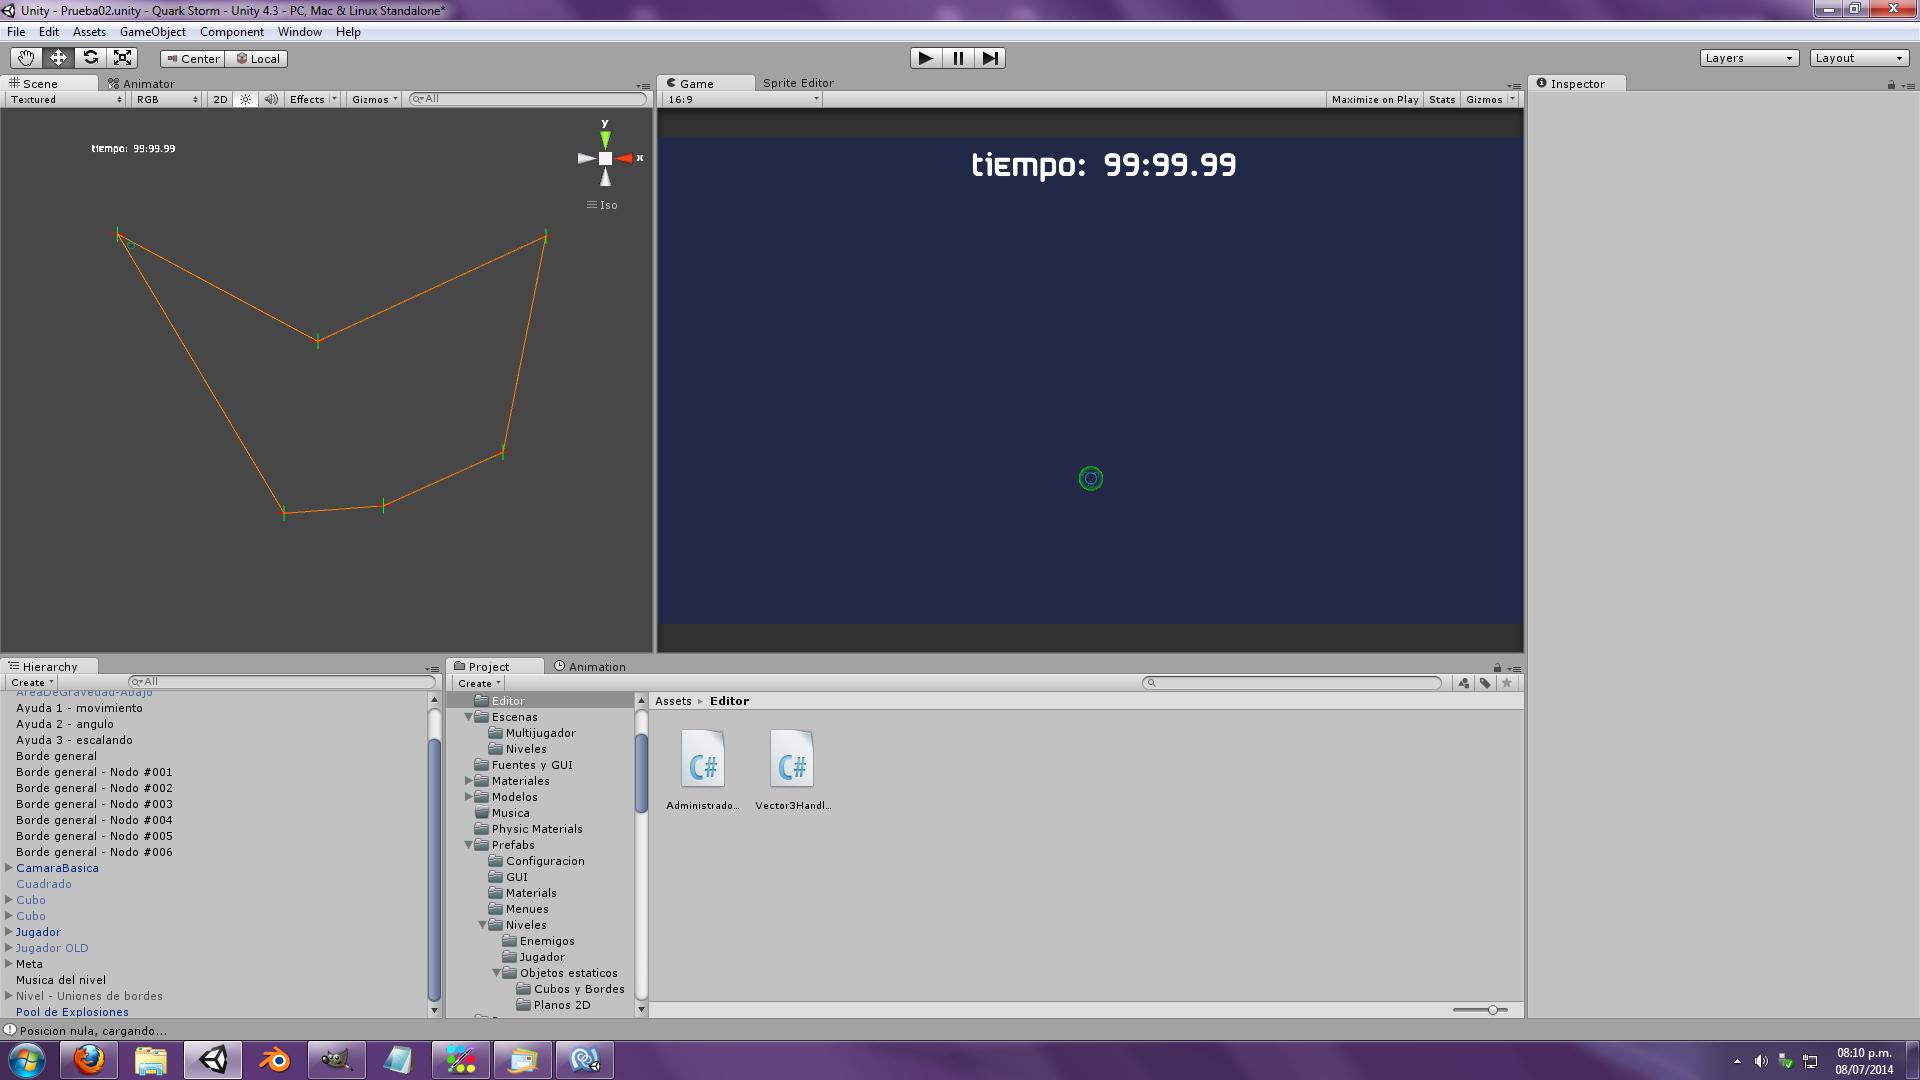 Quark Storm update screenshot - Bezier curve system 01